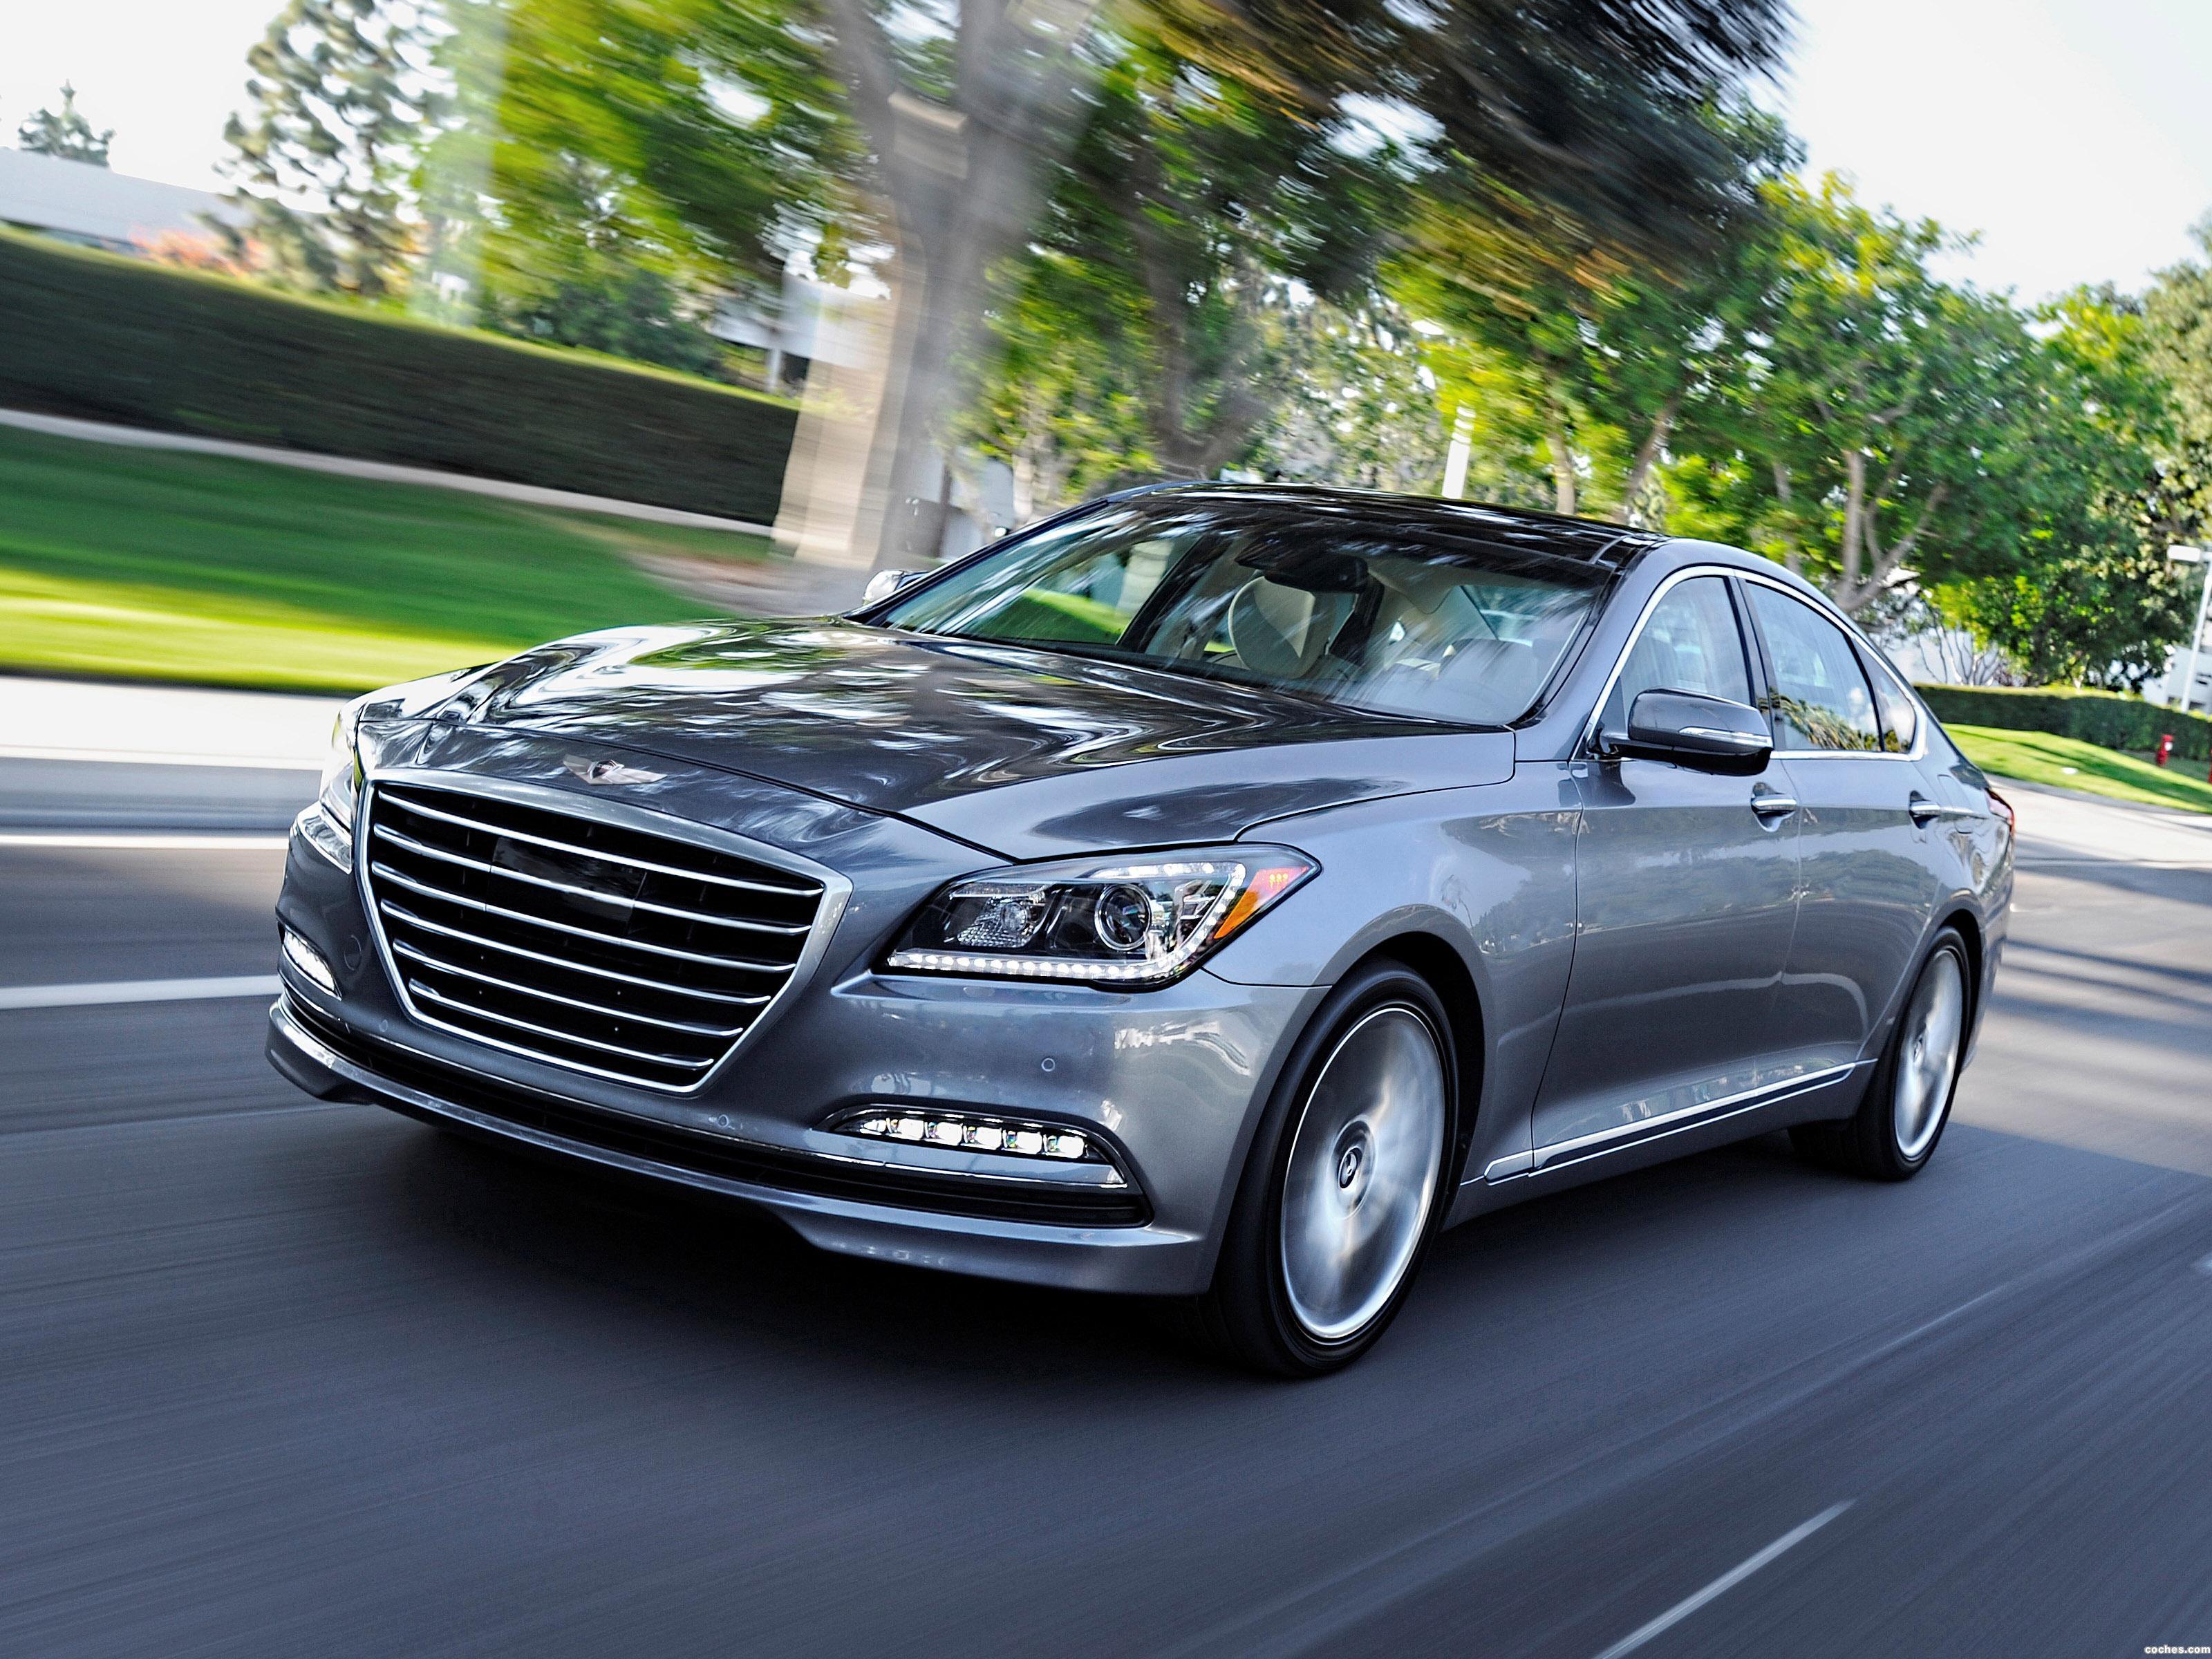 Foto 0 de Hyundai Genesis USA 2014